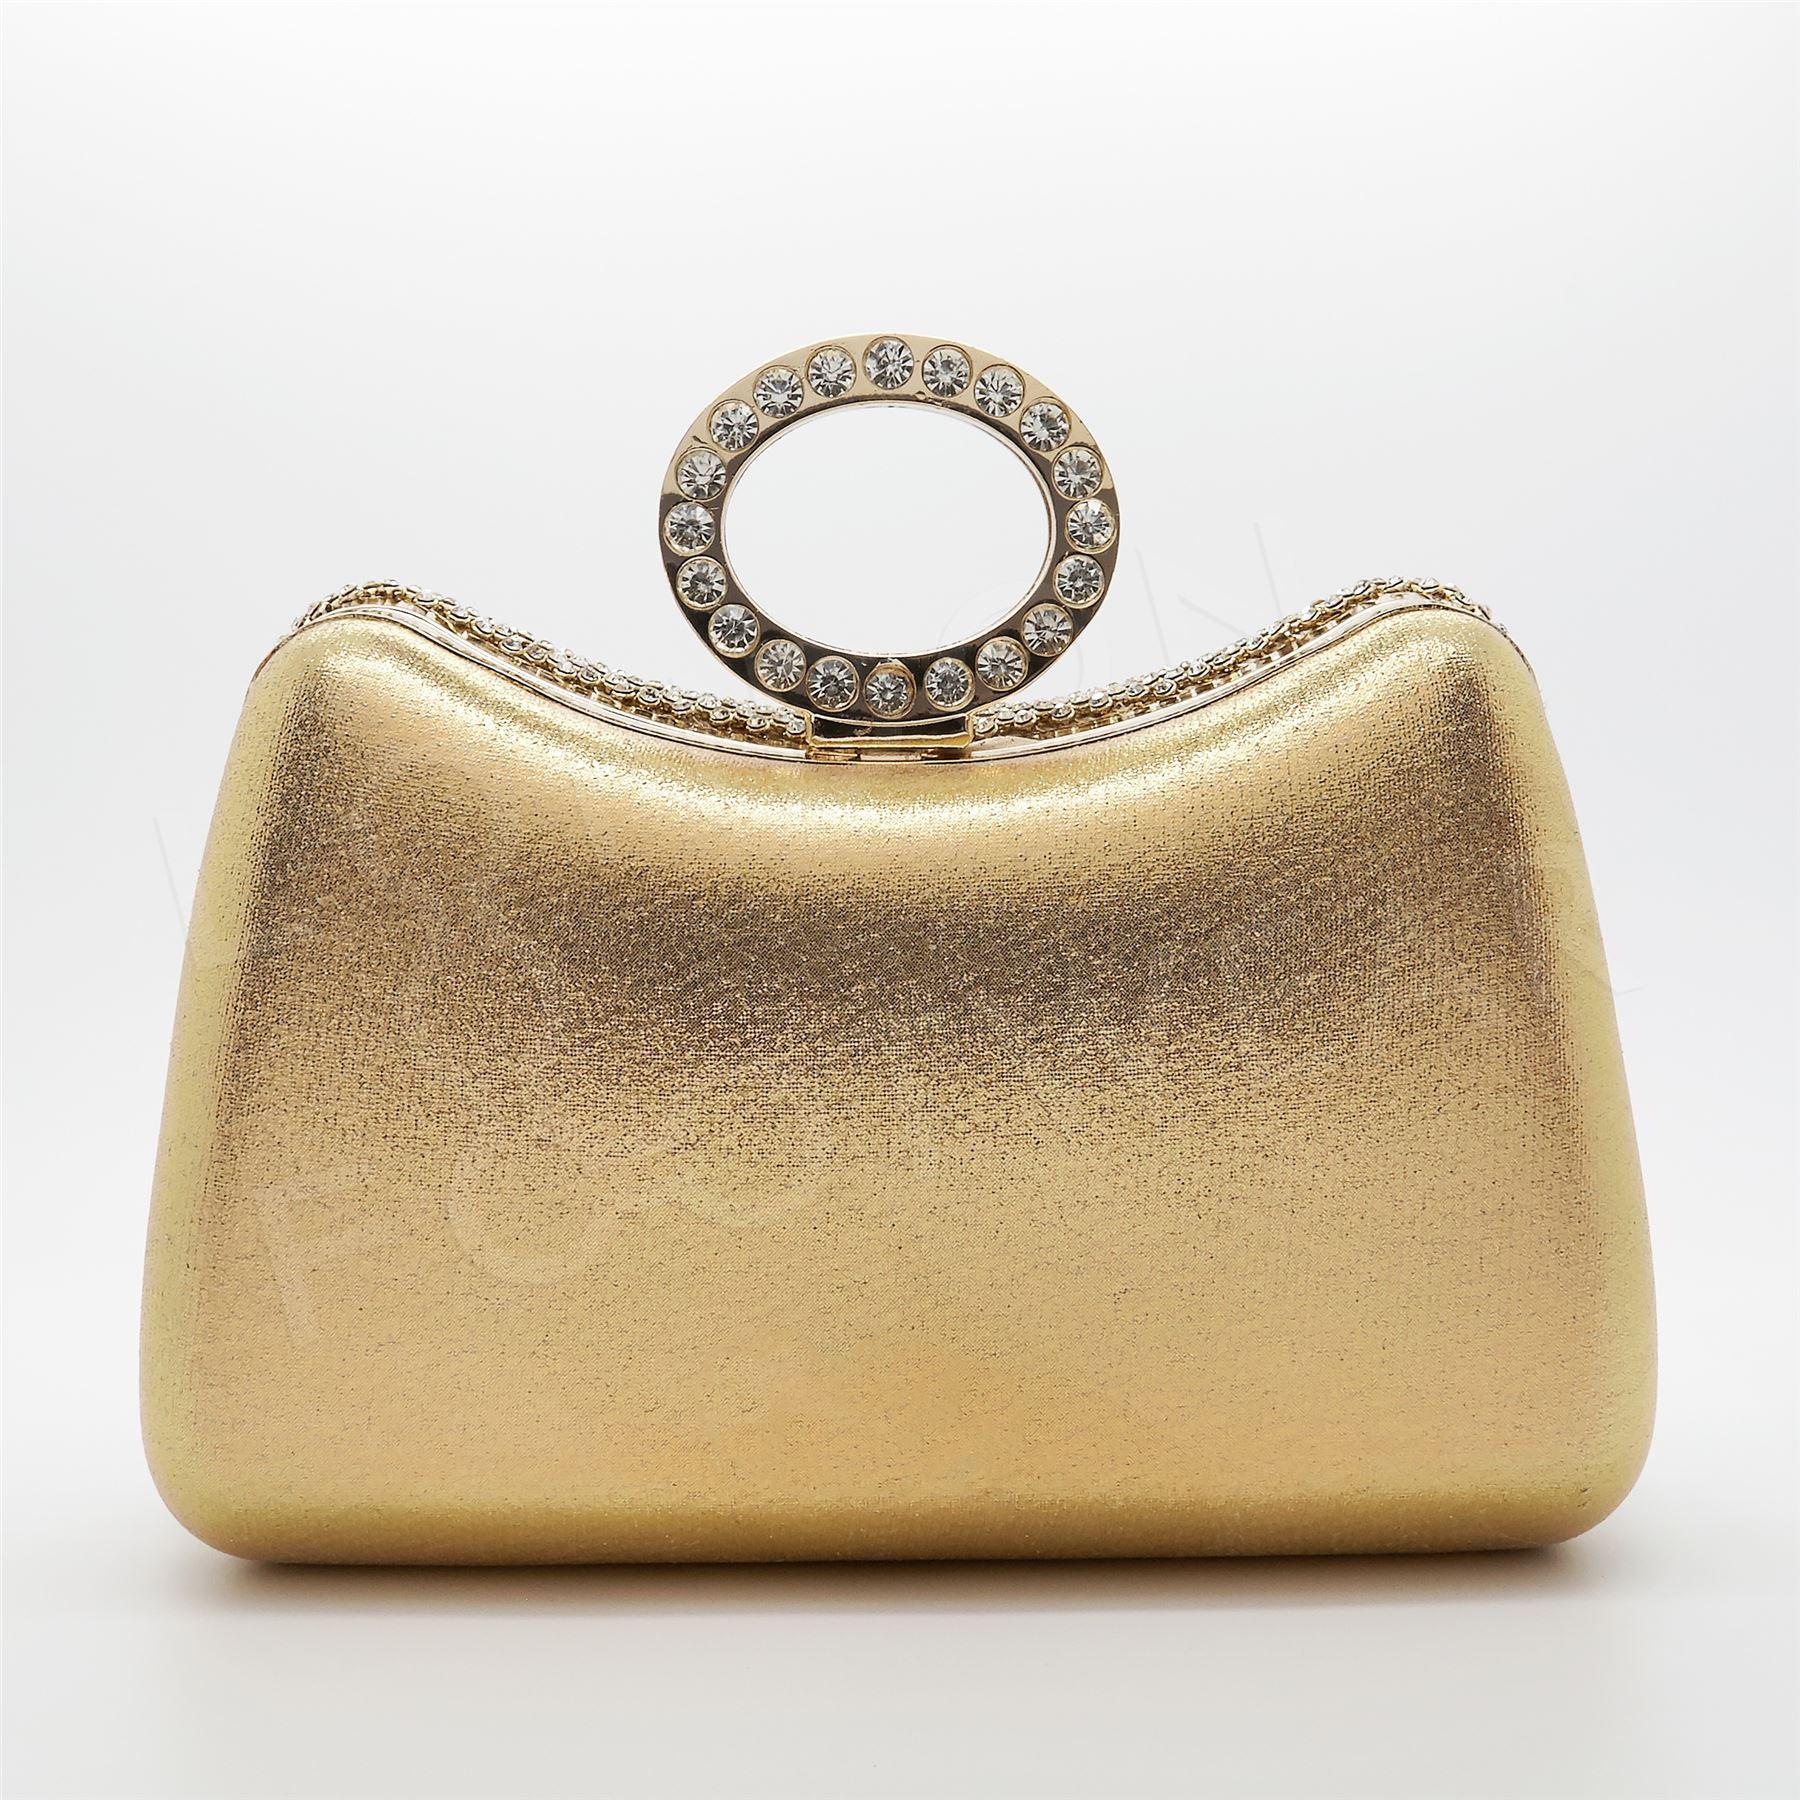 a argento Anello serale Pochette sacco Existencias New Diamante Hay Gold Festa no da Borsa Argento Crystal Uk sposa qwftTHF